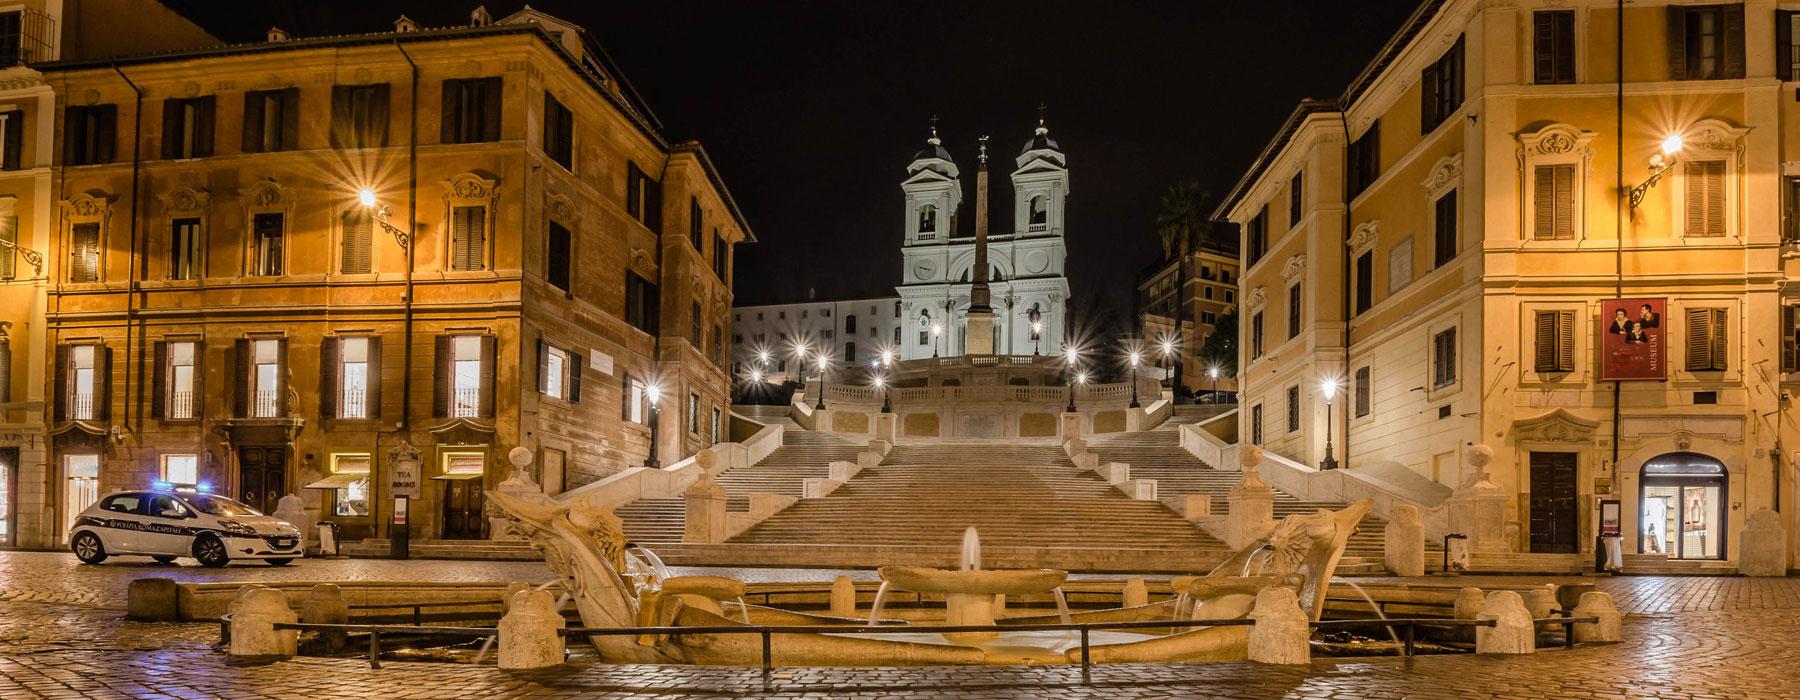 Roma_13.jpg